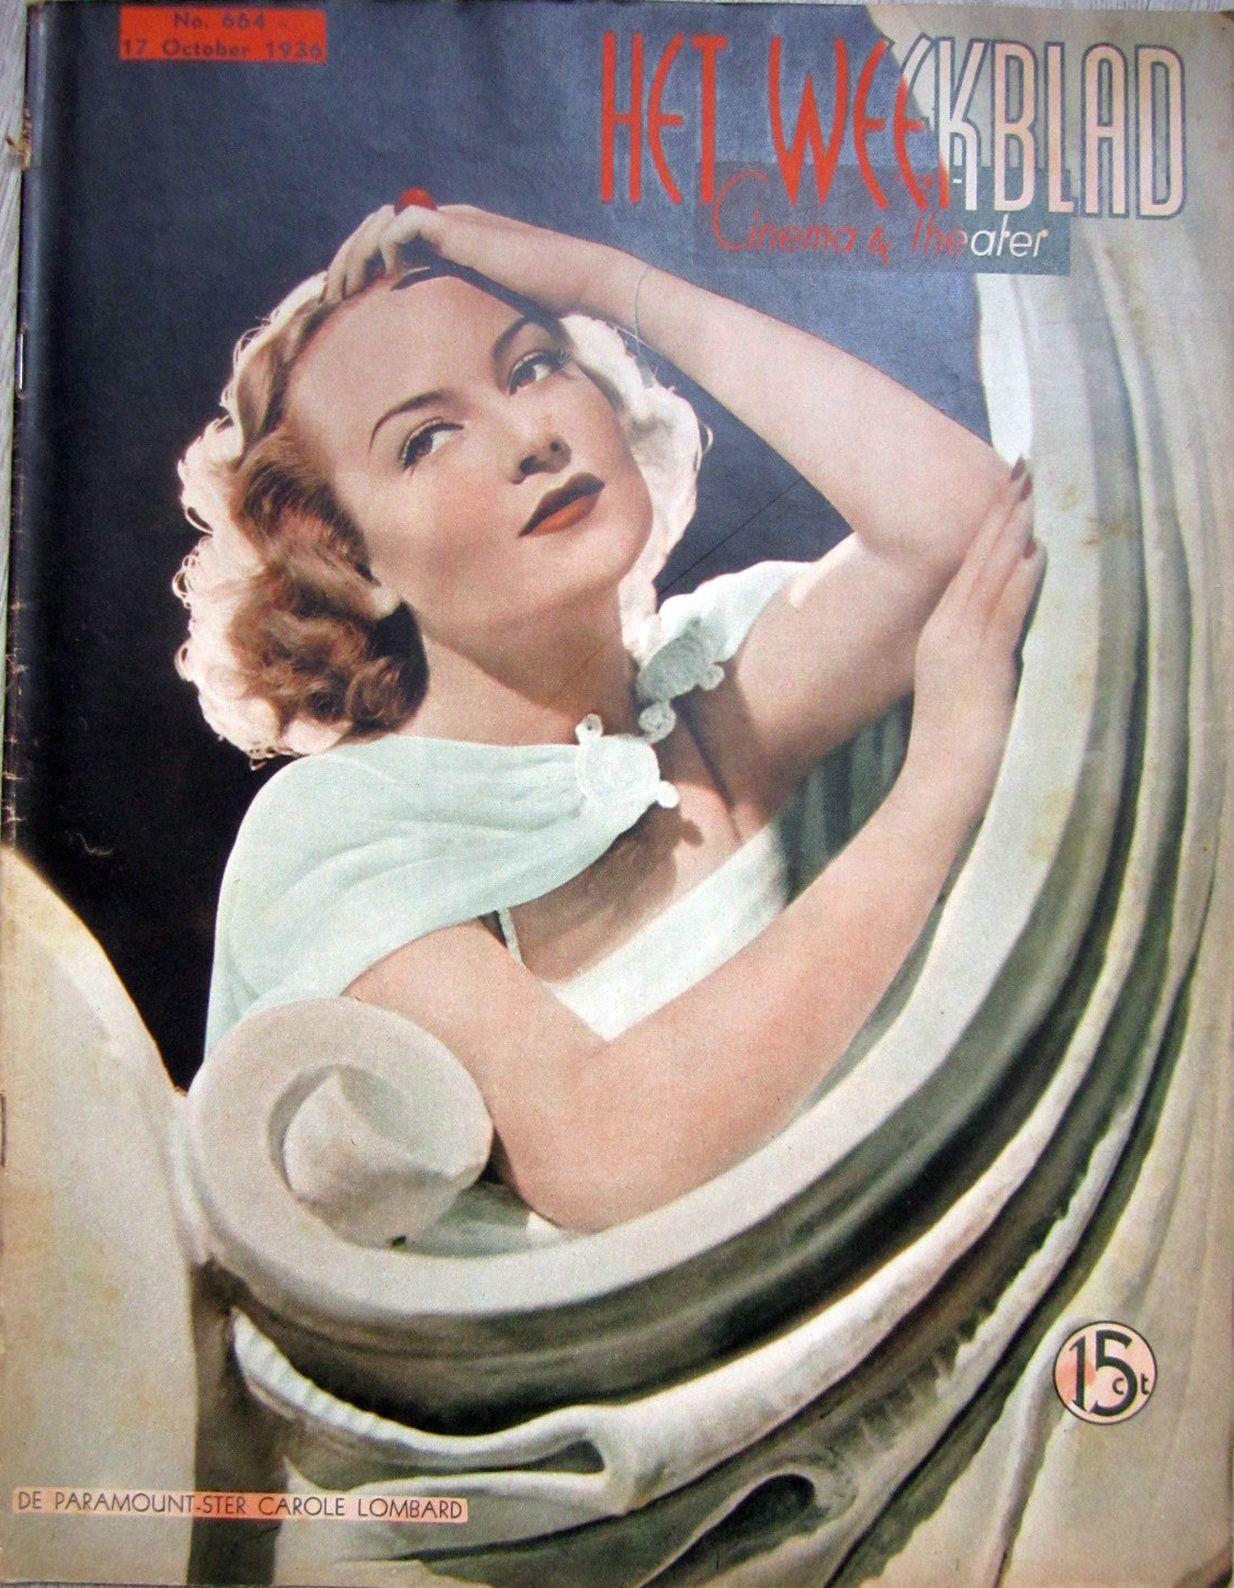 carole lombard cinema & theater 101736a cover